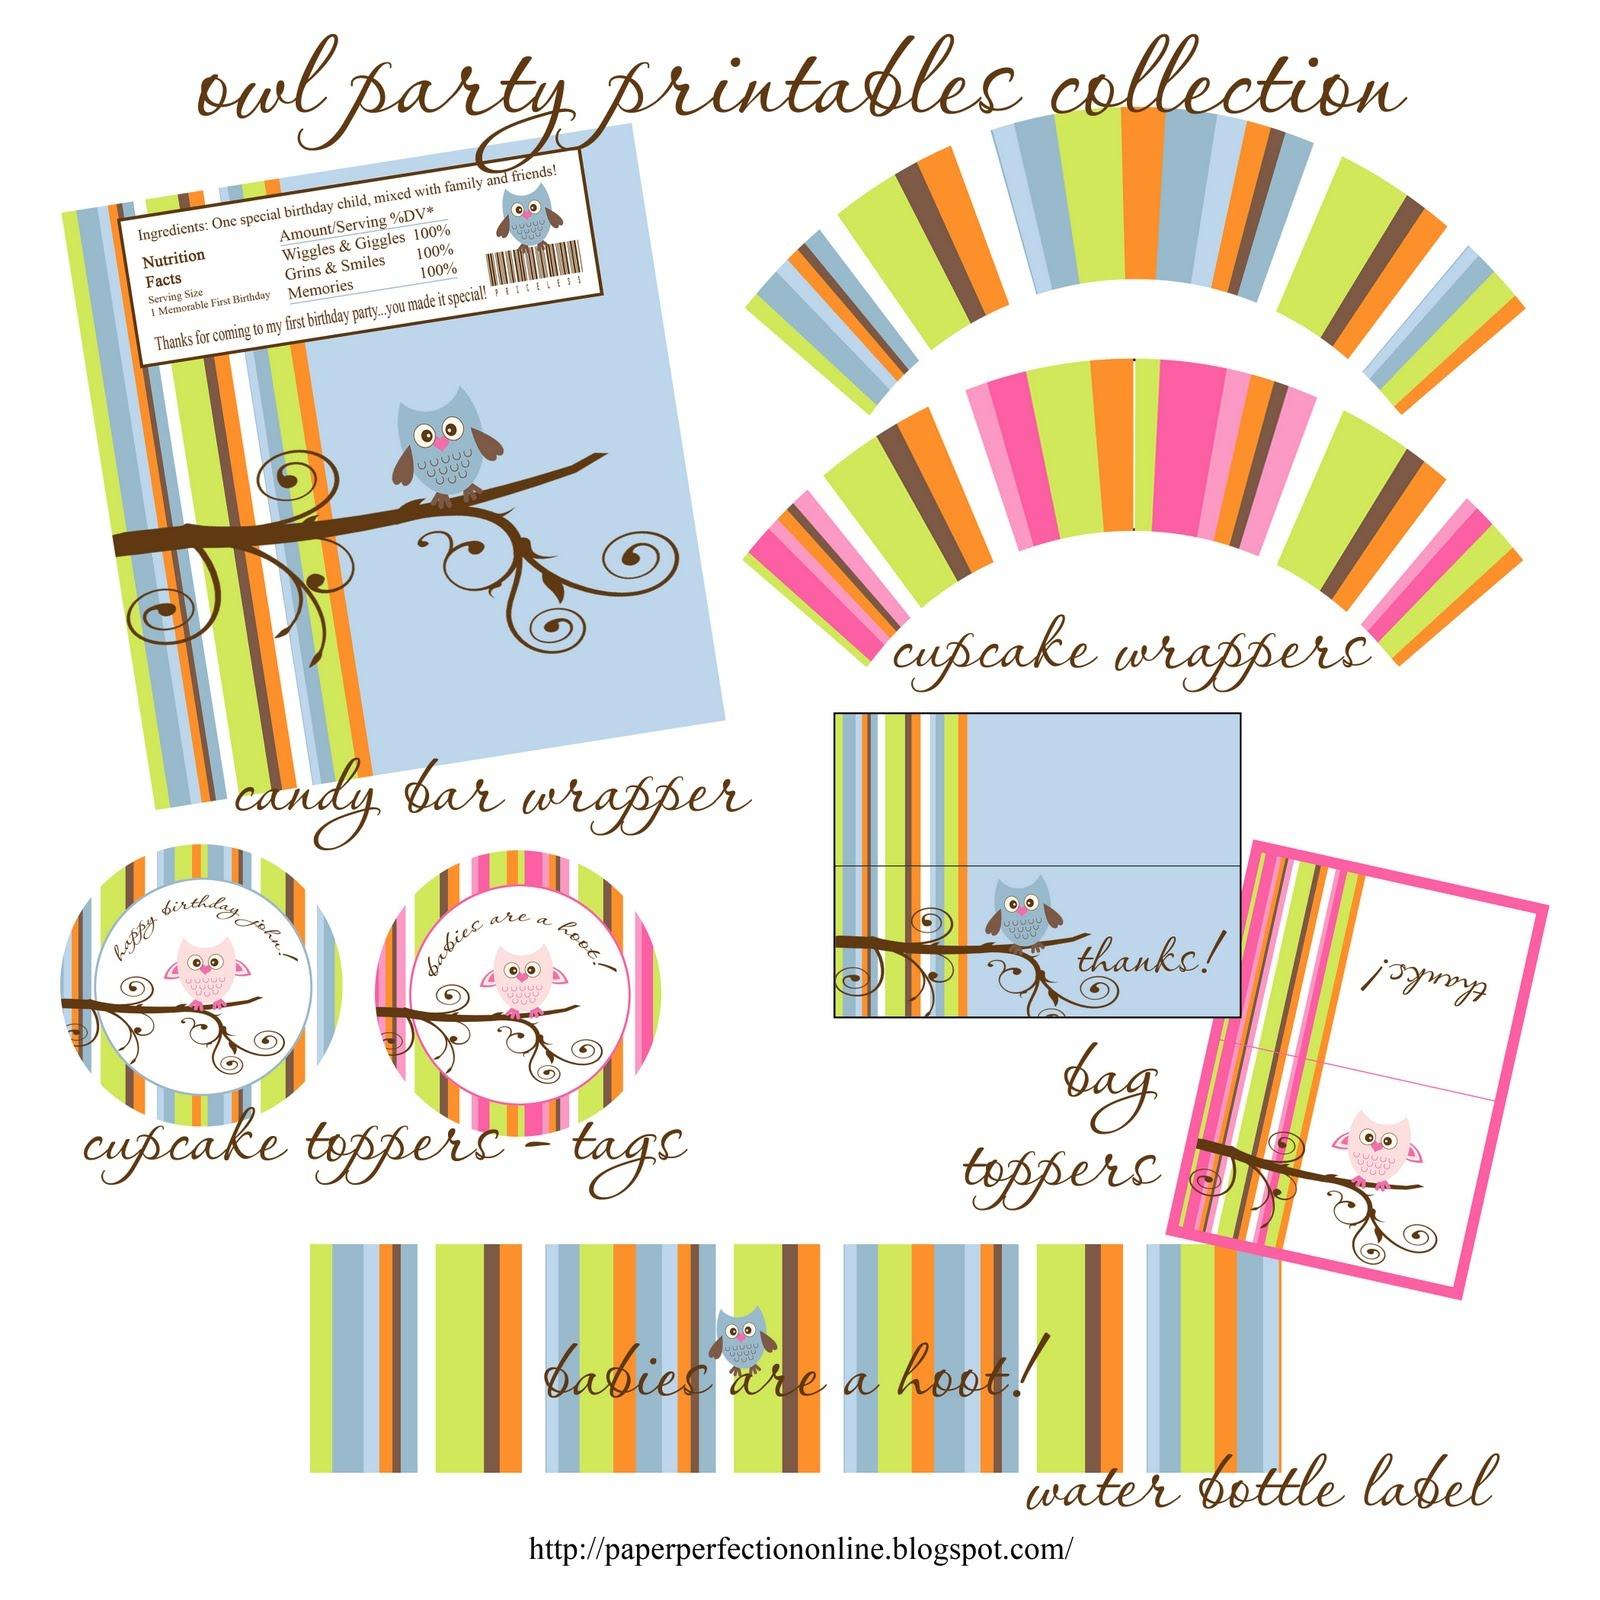 Photo : Free Baby Shower Printables Cupcake Image - Free Baby Shower Printables Decorations